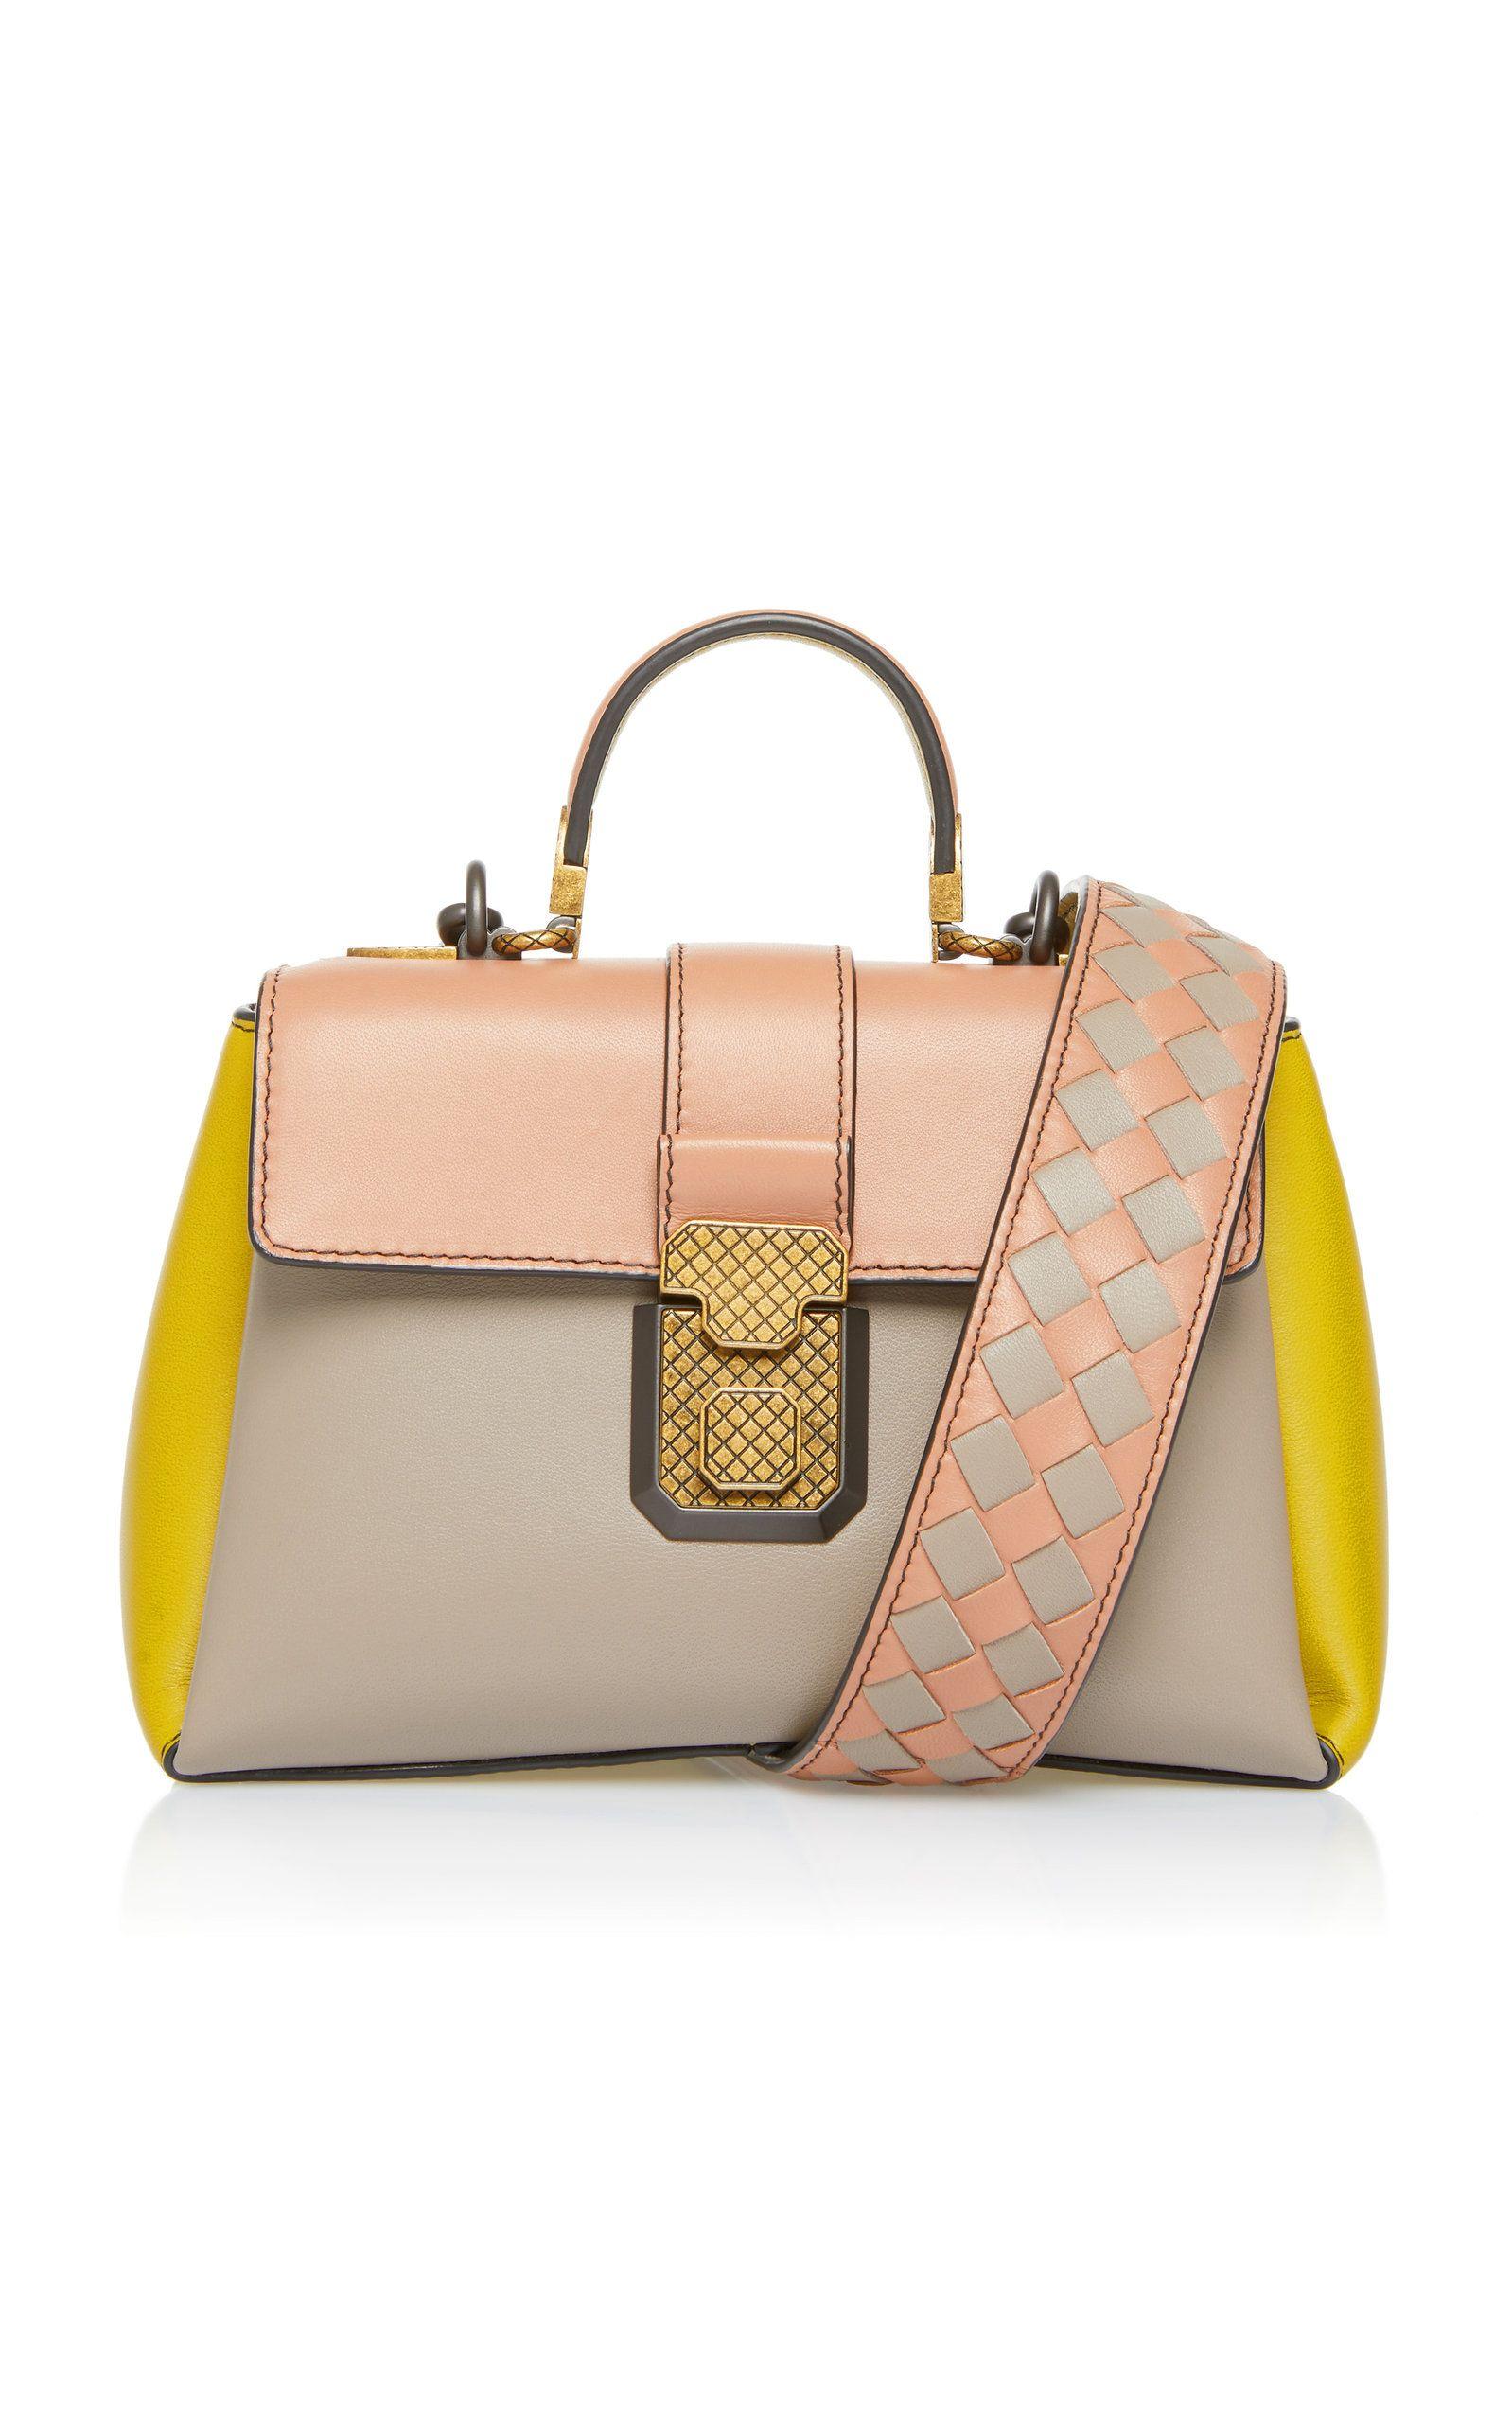 Multicolor Piazza Leather Top Handle Bag By Bottega Veneta Now Available On Moda Operandi